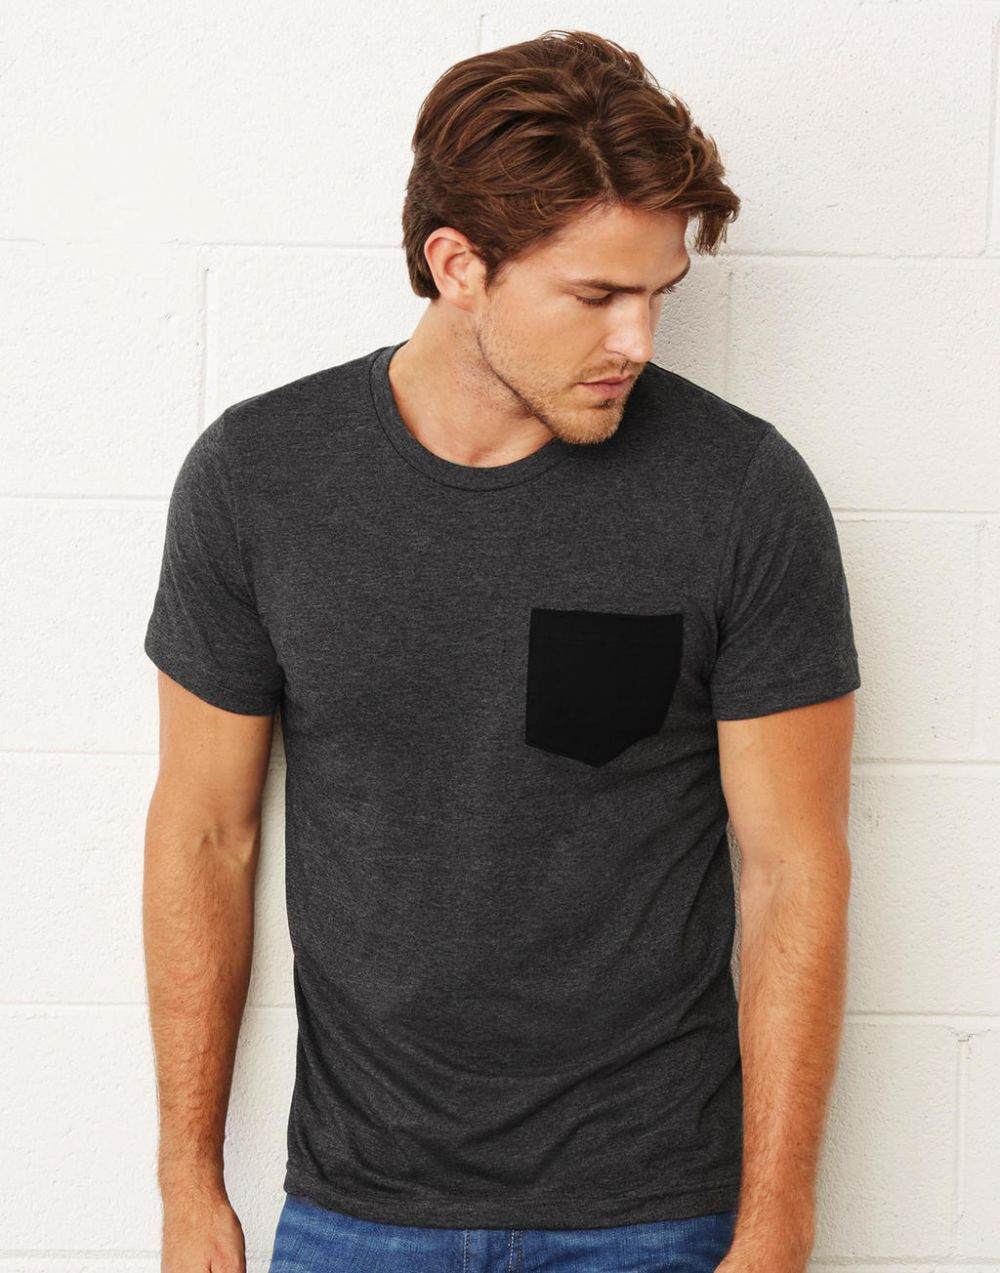 Camisetas manga corta bella con bolsillo hombre con logo vista 2